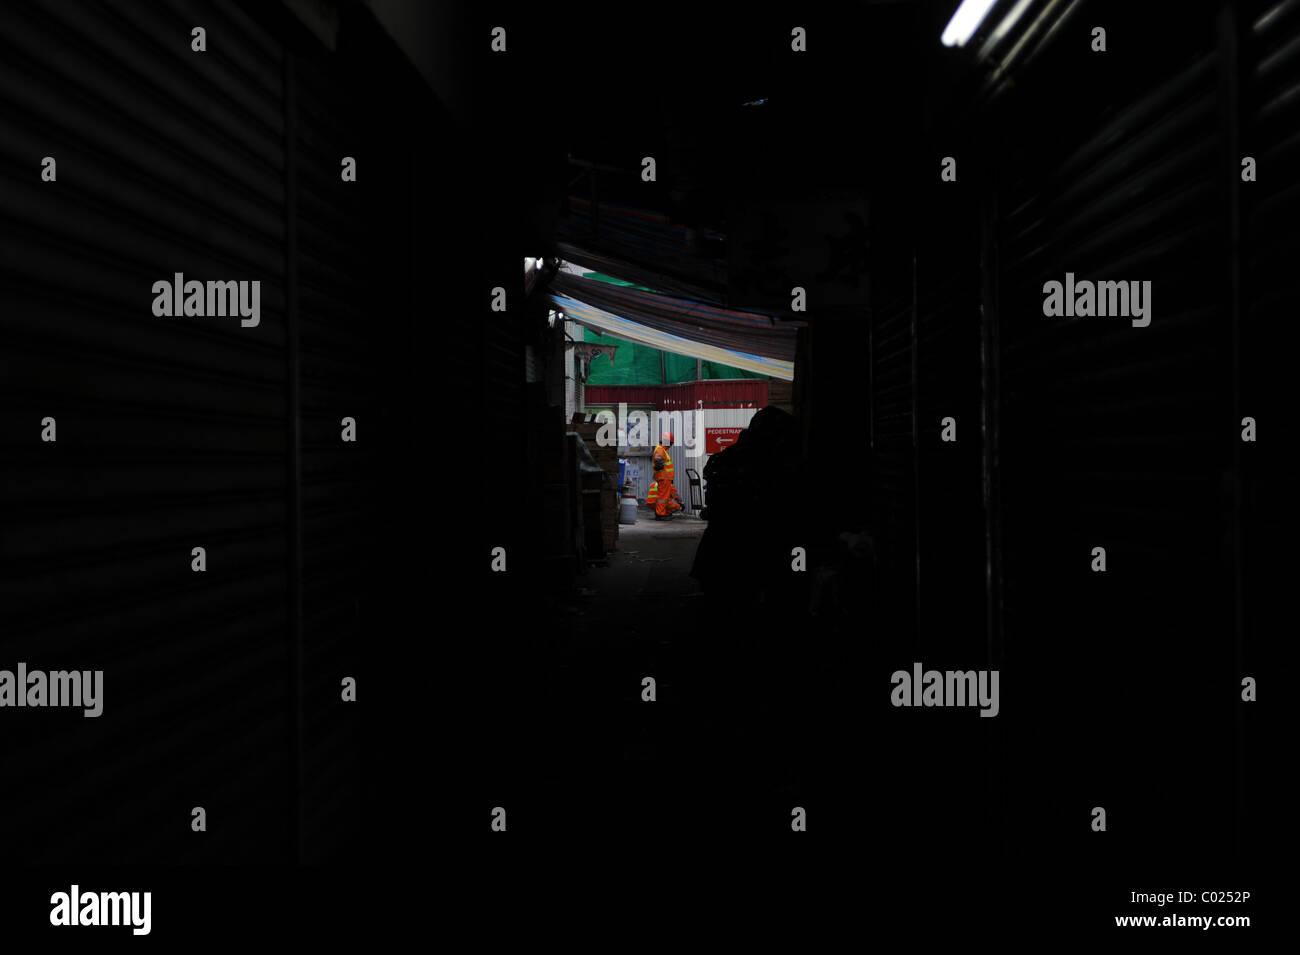 Builder al final de una calle oscura, Hong kong Imagen De Stock